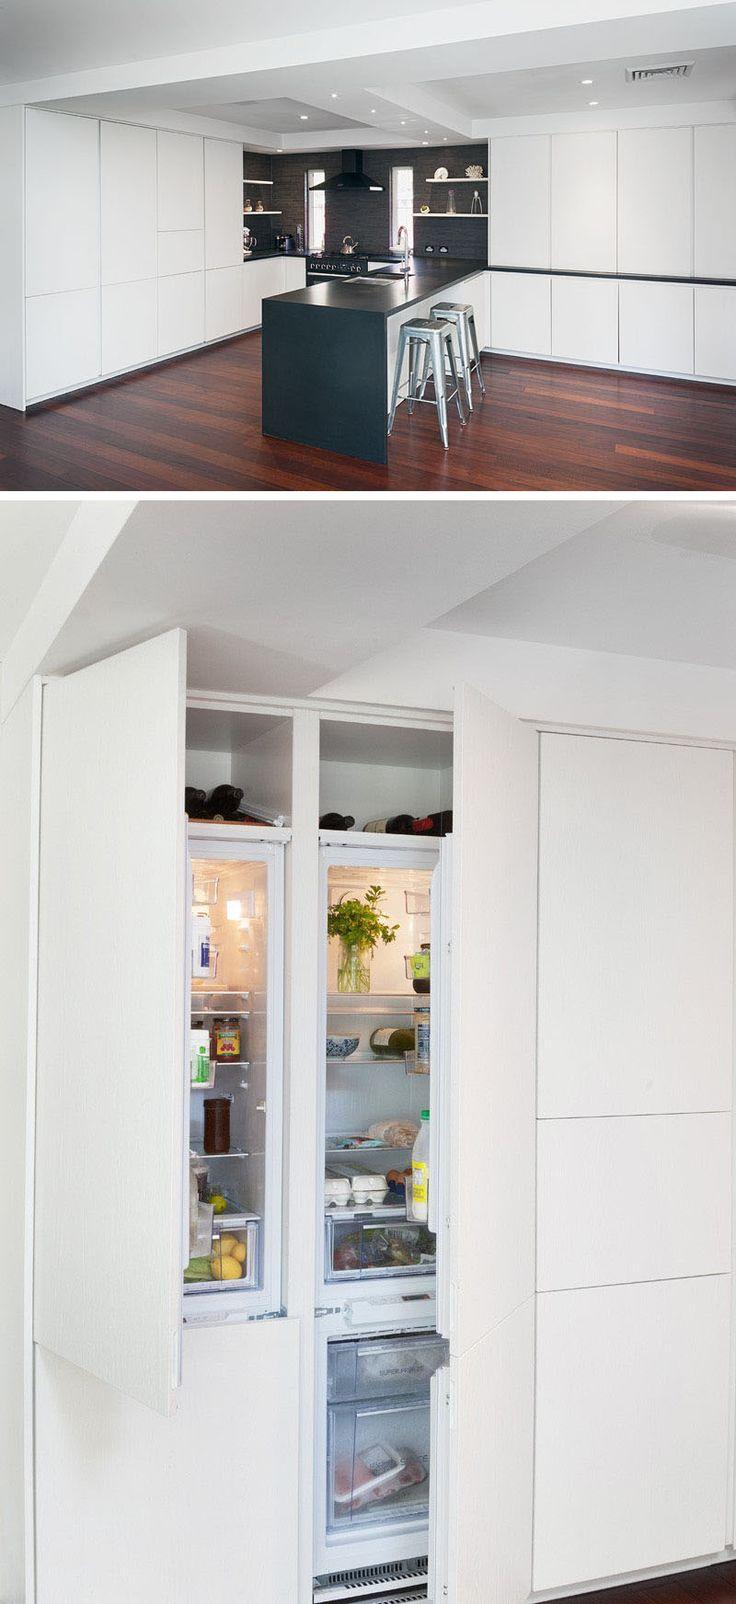 Uncategorized Kitchen Integrated Appliances best 25 integrated fridge ideas on pinterest kitchen design idea 10 inspirational examples of kitchens with fridges the fridge